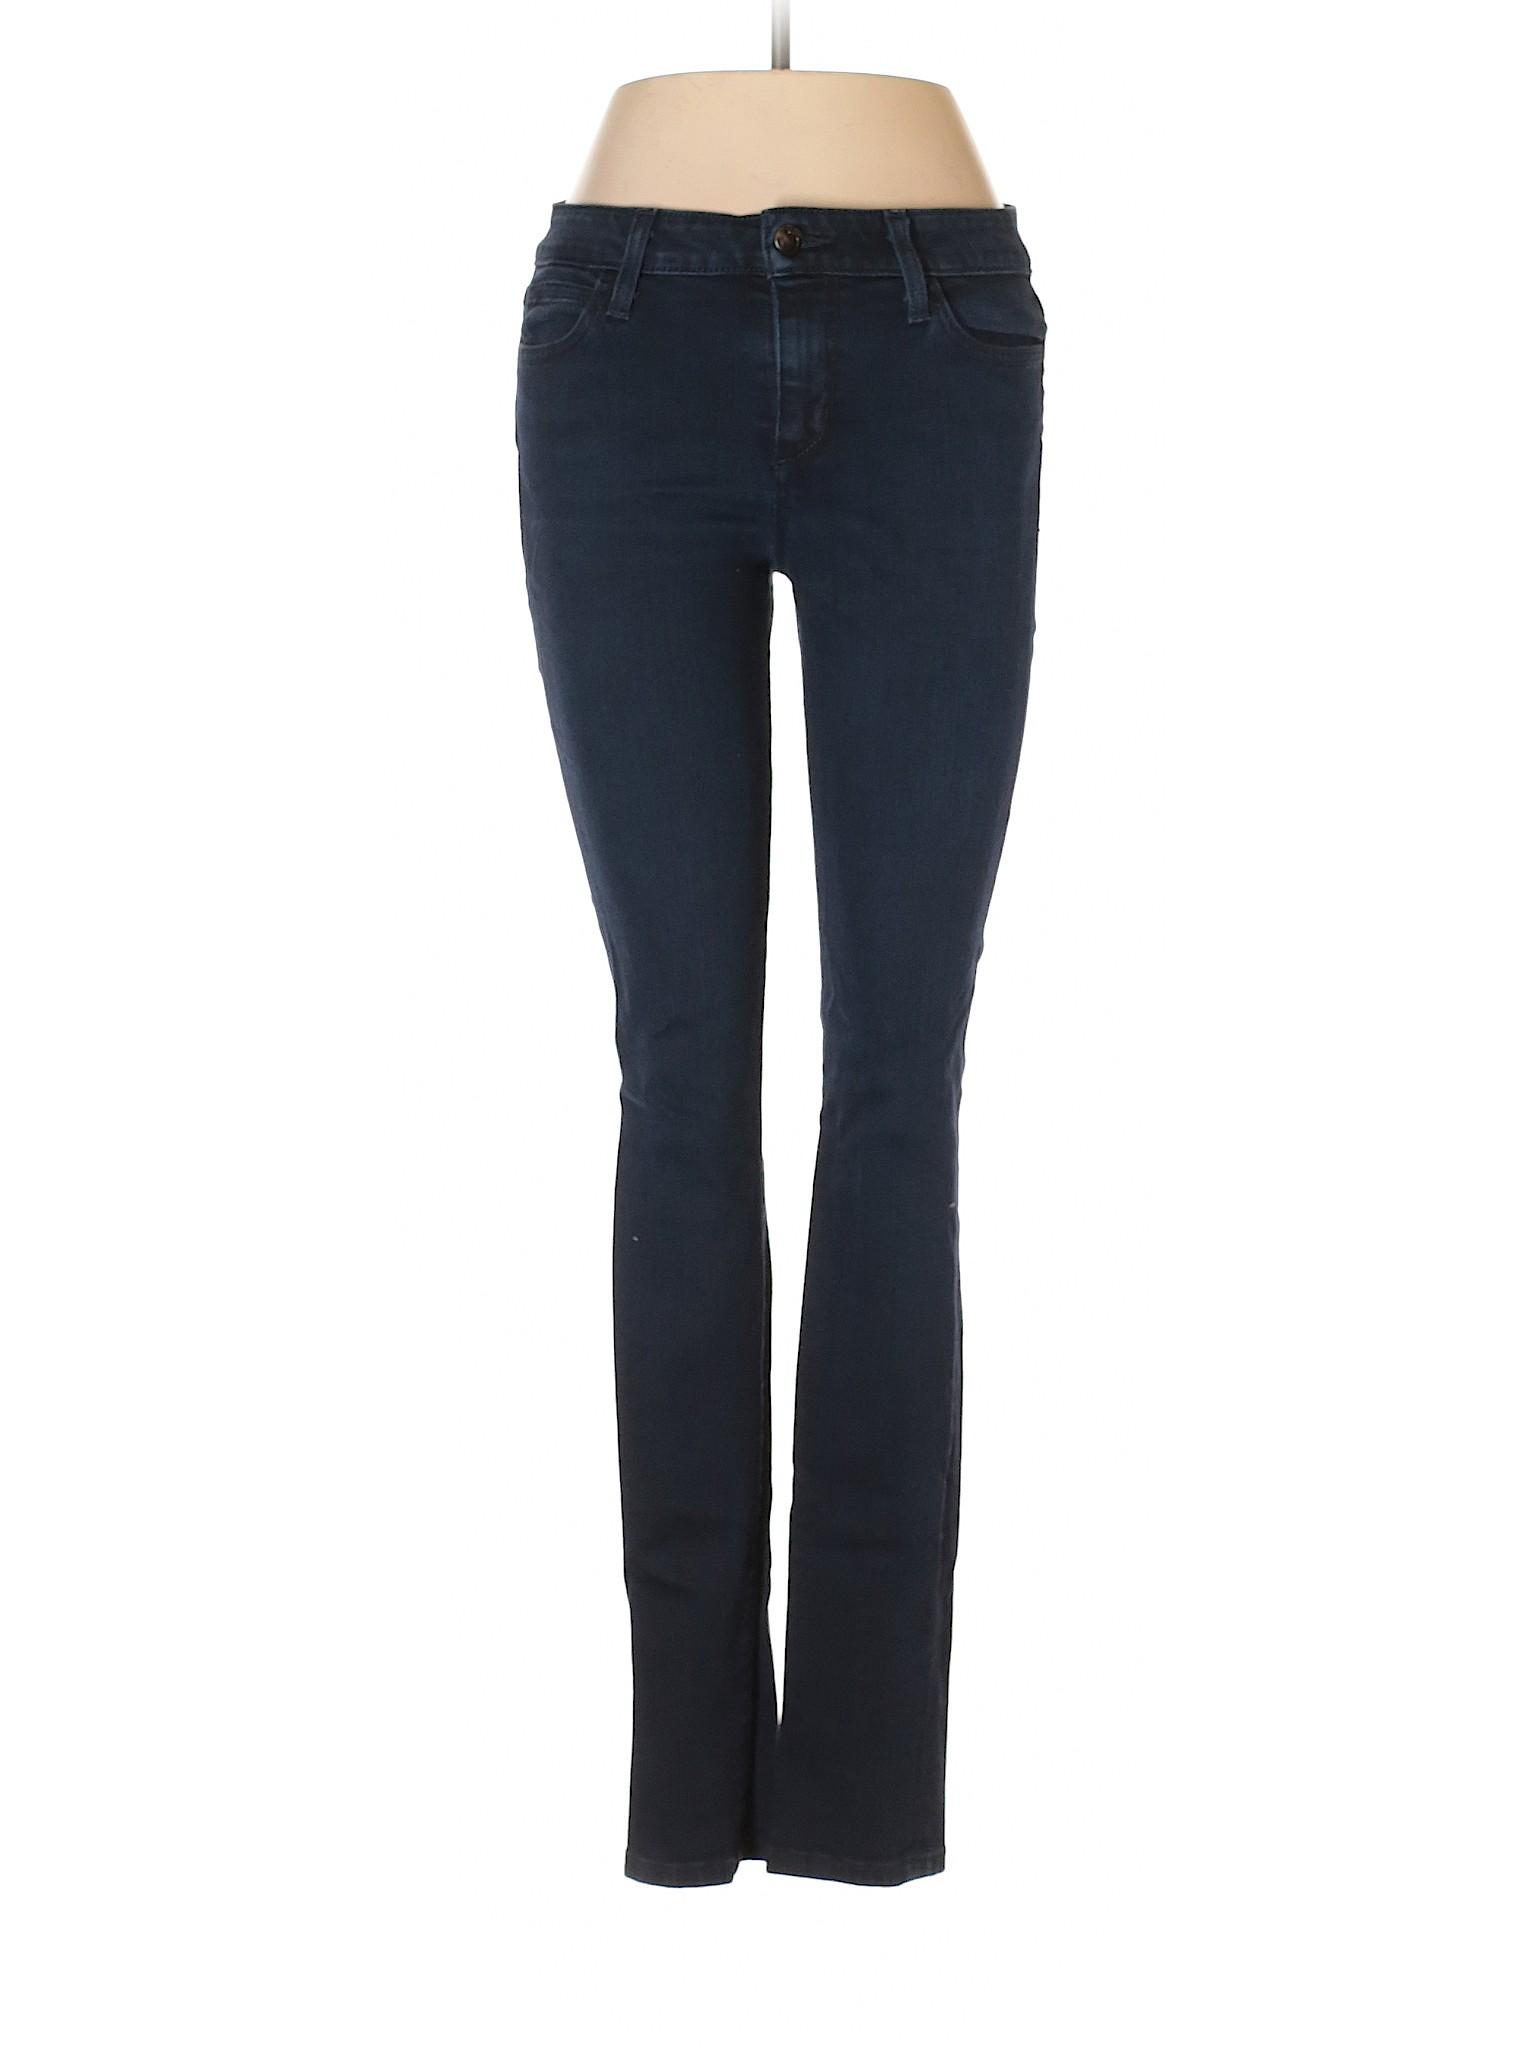 Promotion Joe's Jeans Jeans Joe's Promotion E5w8xqv